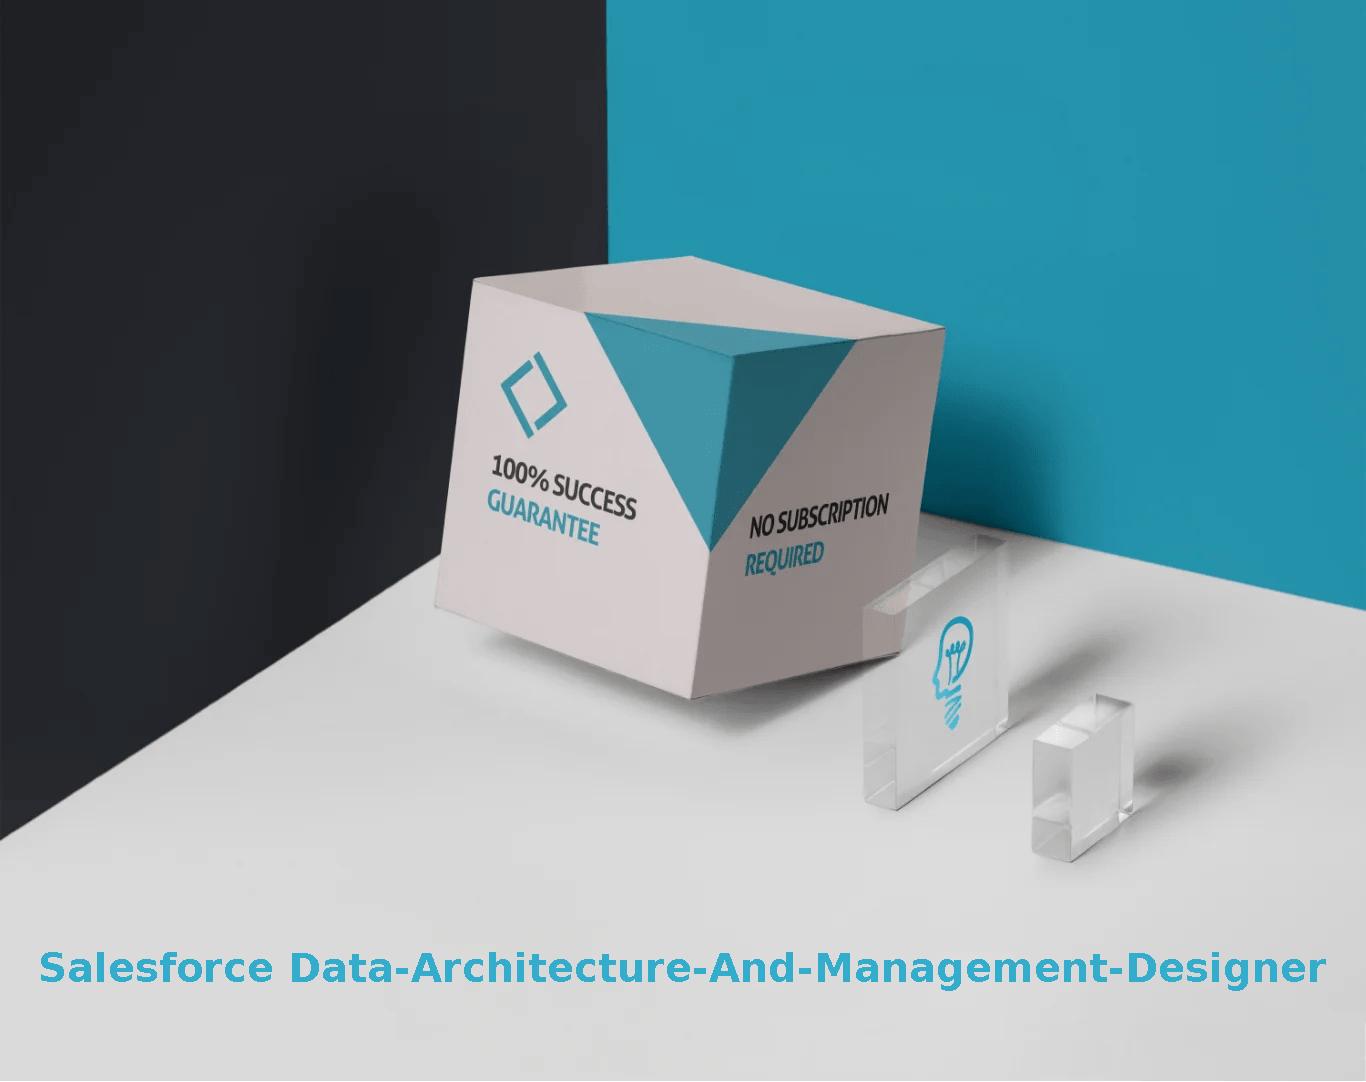 Salesforce Data-Architecture-And-Management-Designer Exams